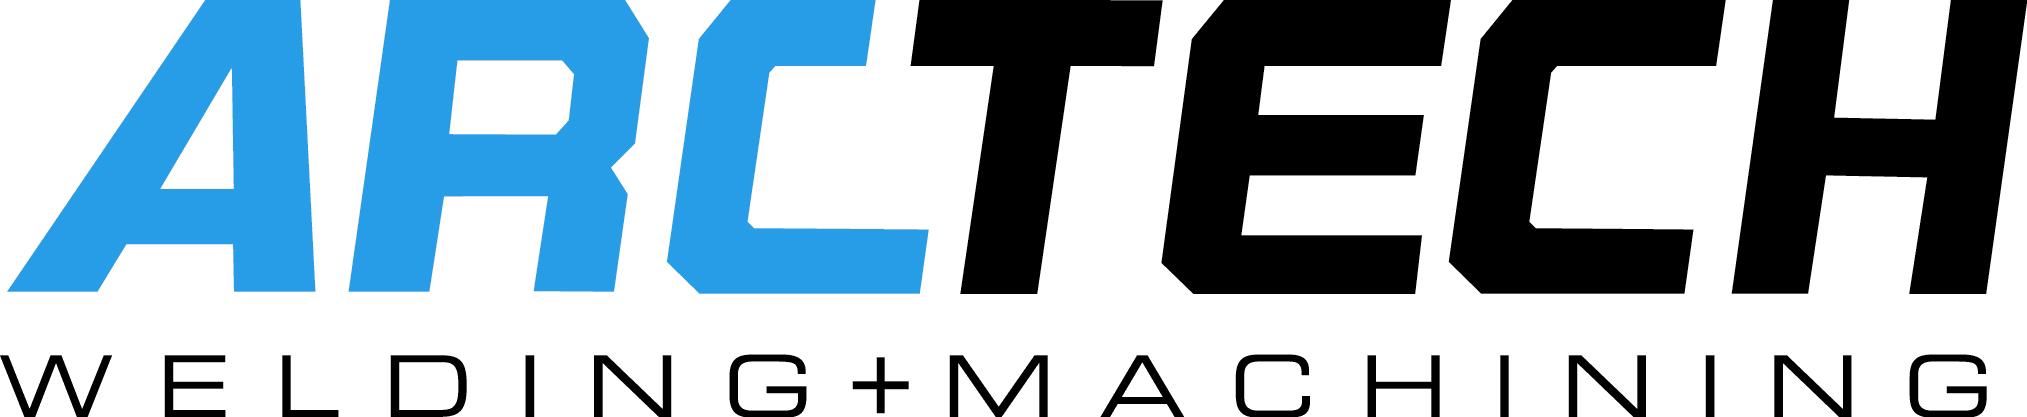 arctech-logo.png